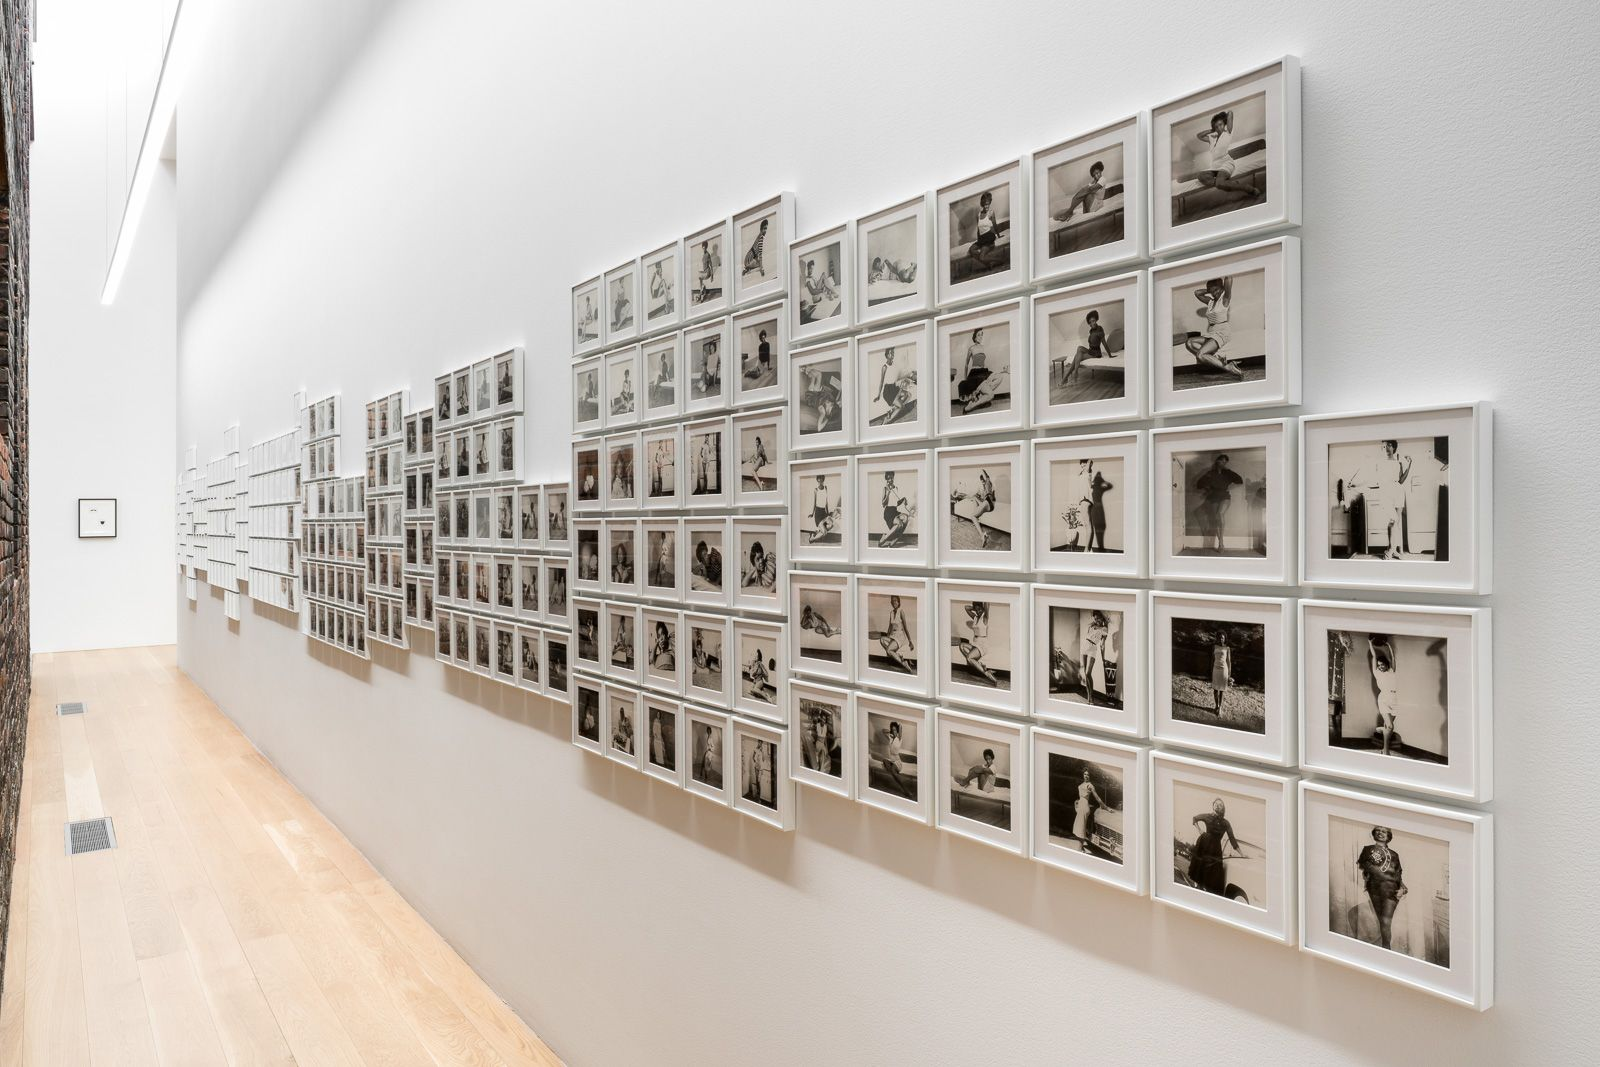 1957-2009, 2009 Rennie Collection (install view)